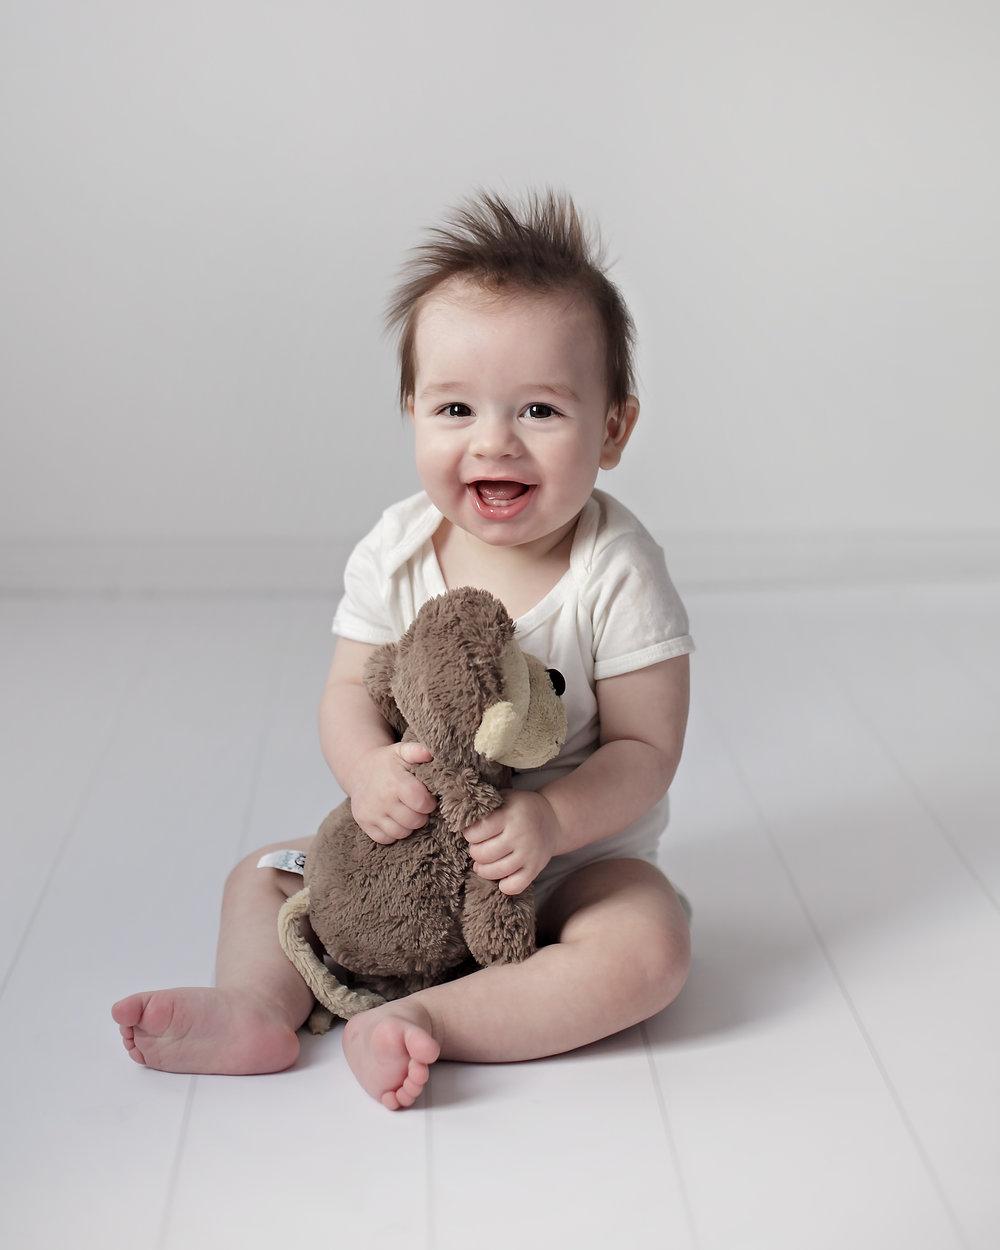 Baby_Stuffy_Petra_King_Photography_Studio